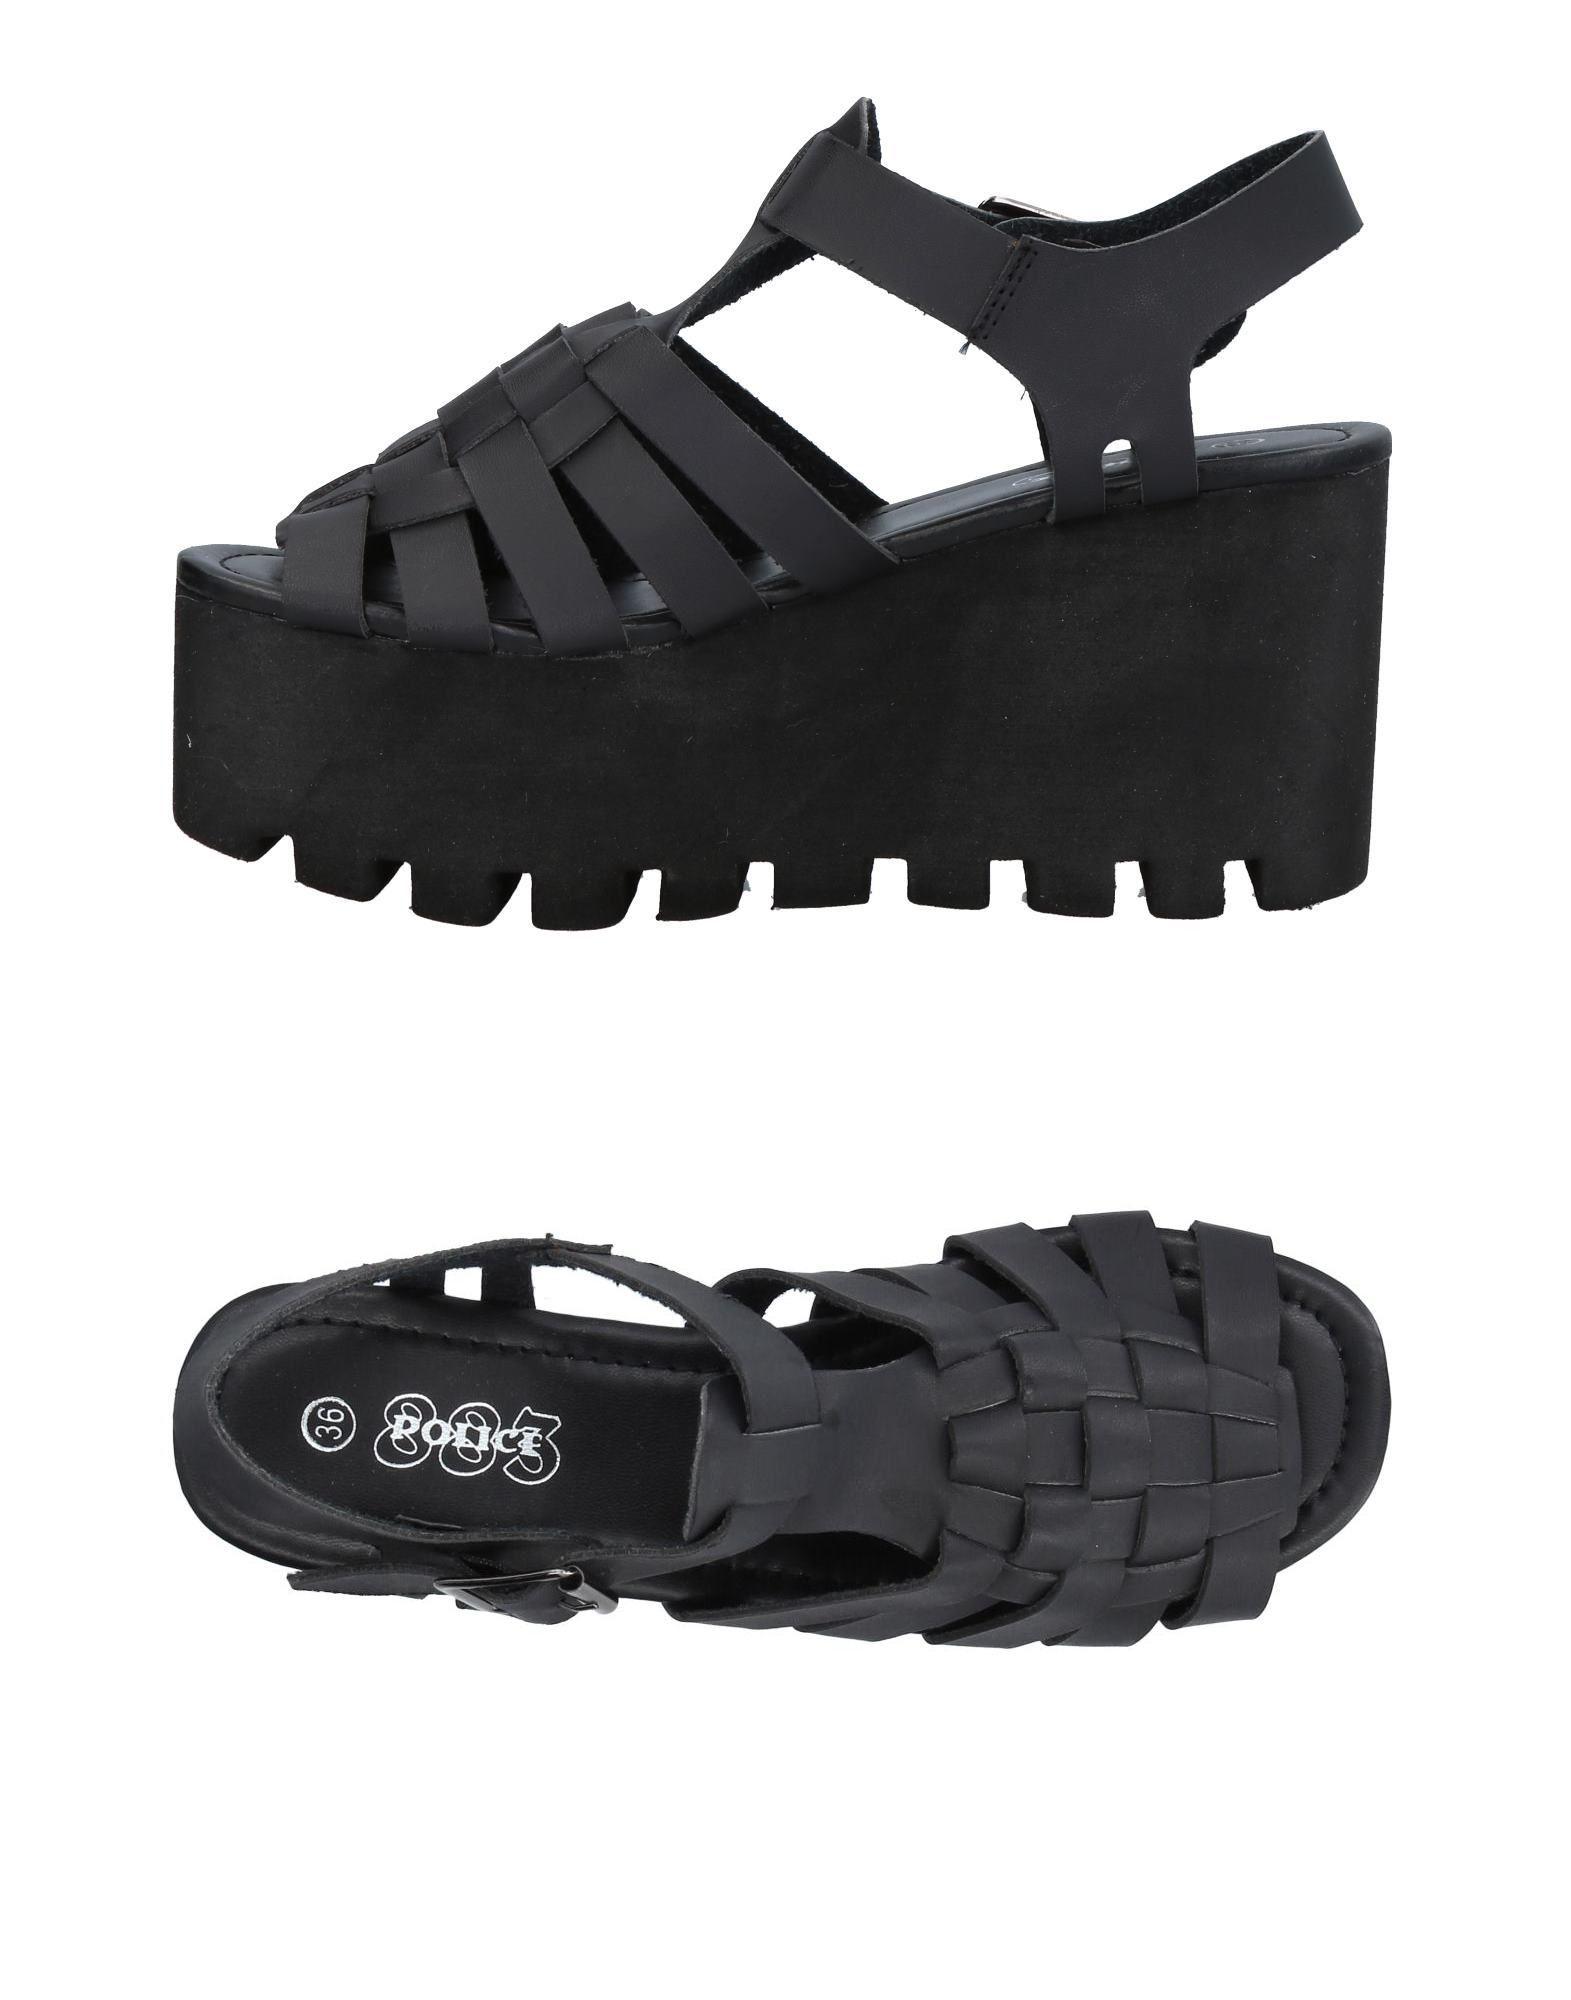 Police 883 Sandalen Damen  11395664FA Gute Qualität beliebte Schuhe